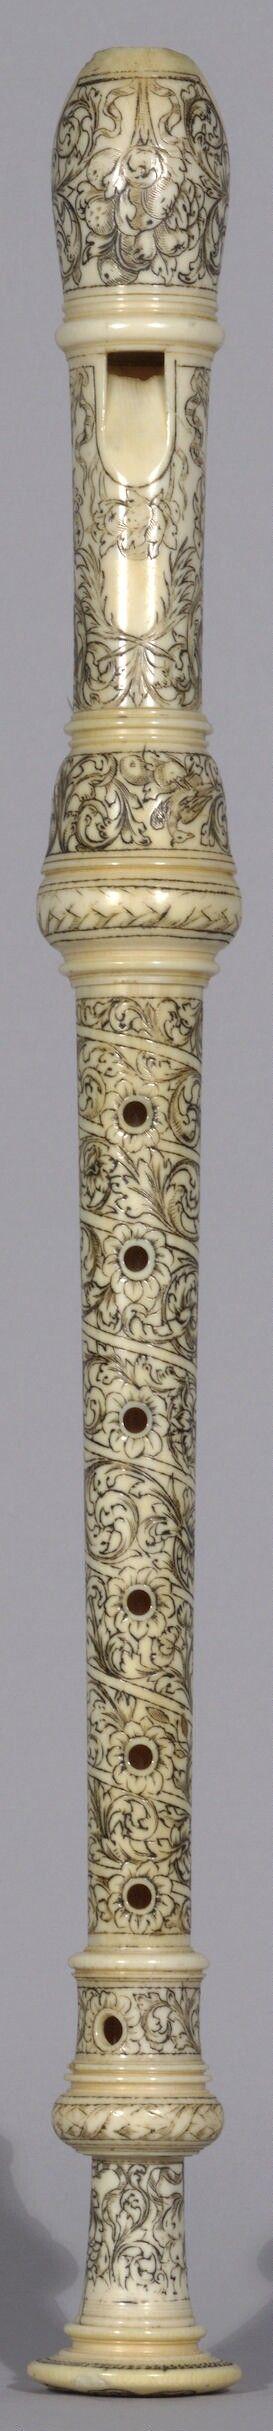 Carved Ivory Alto recorder (Johann Benedikt Gahn, 1698-1711)